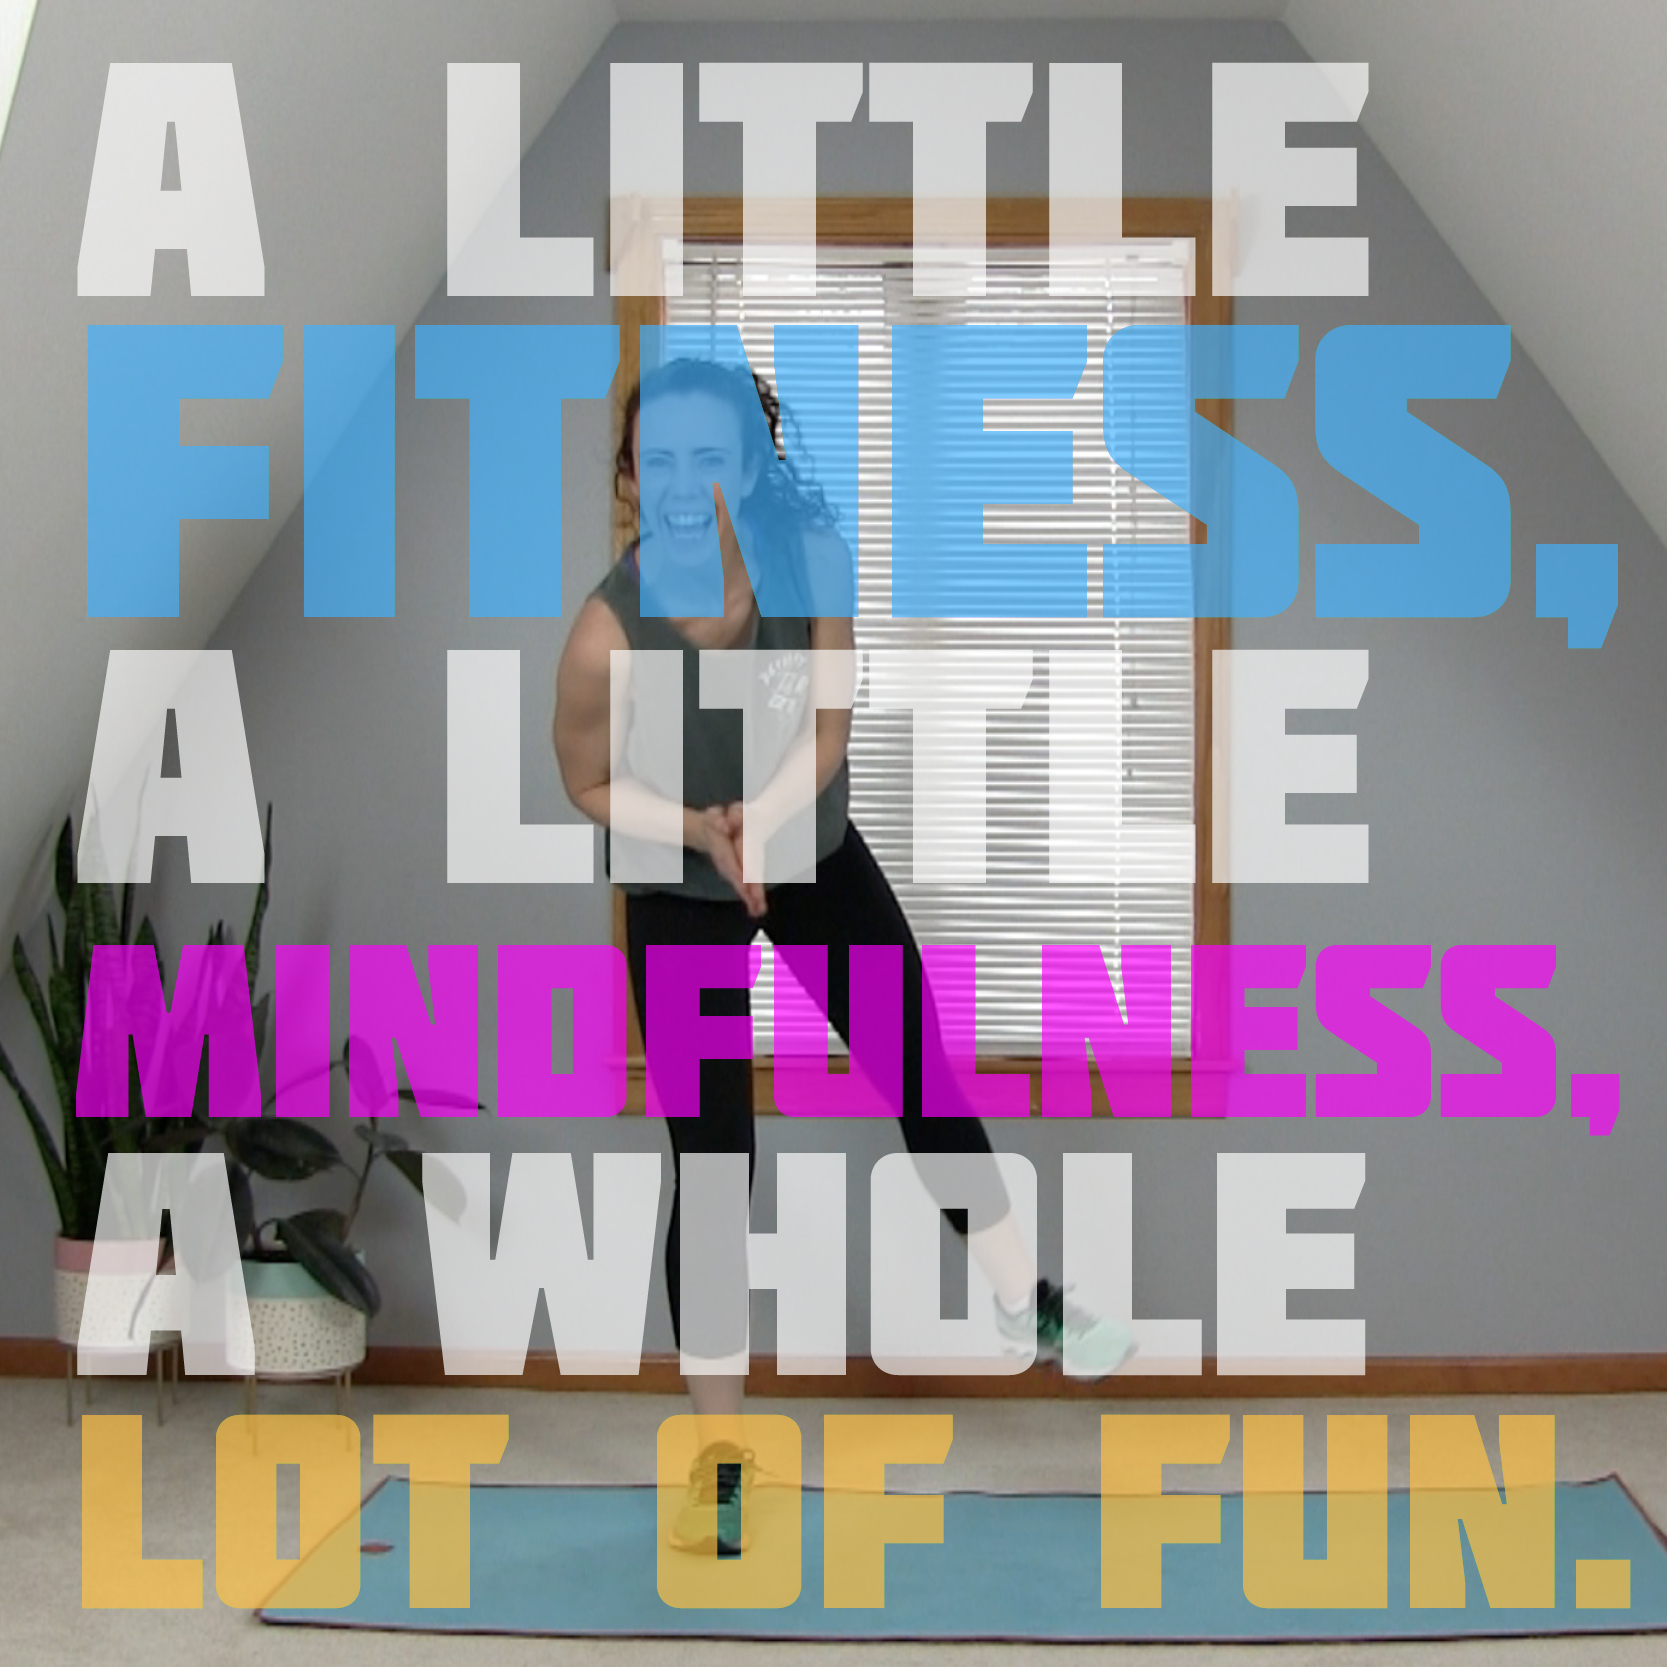 littlefitness.jpg